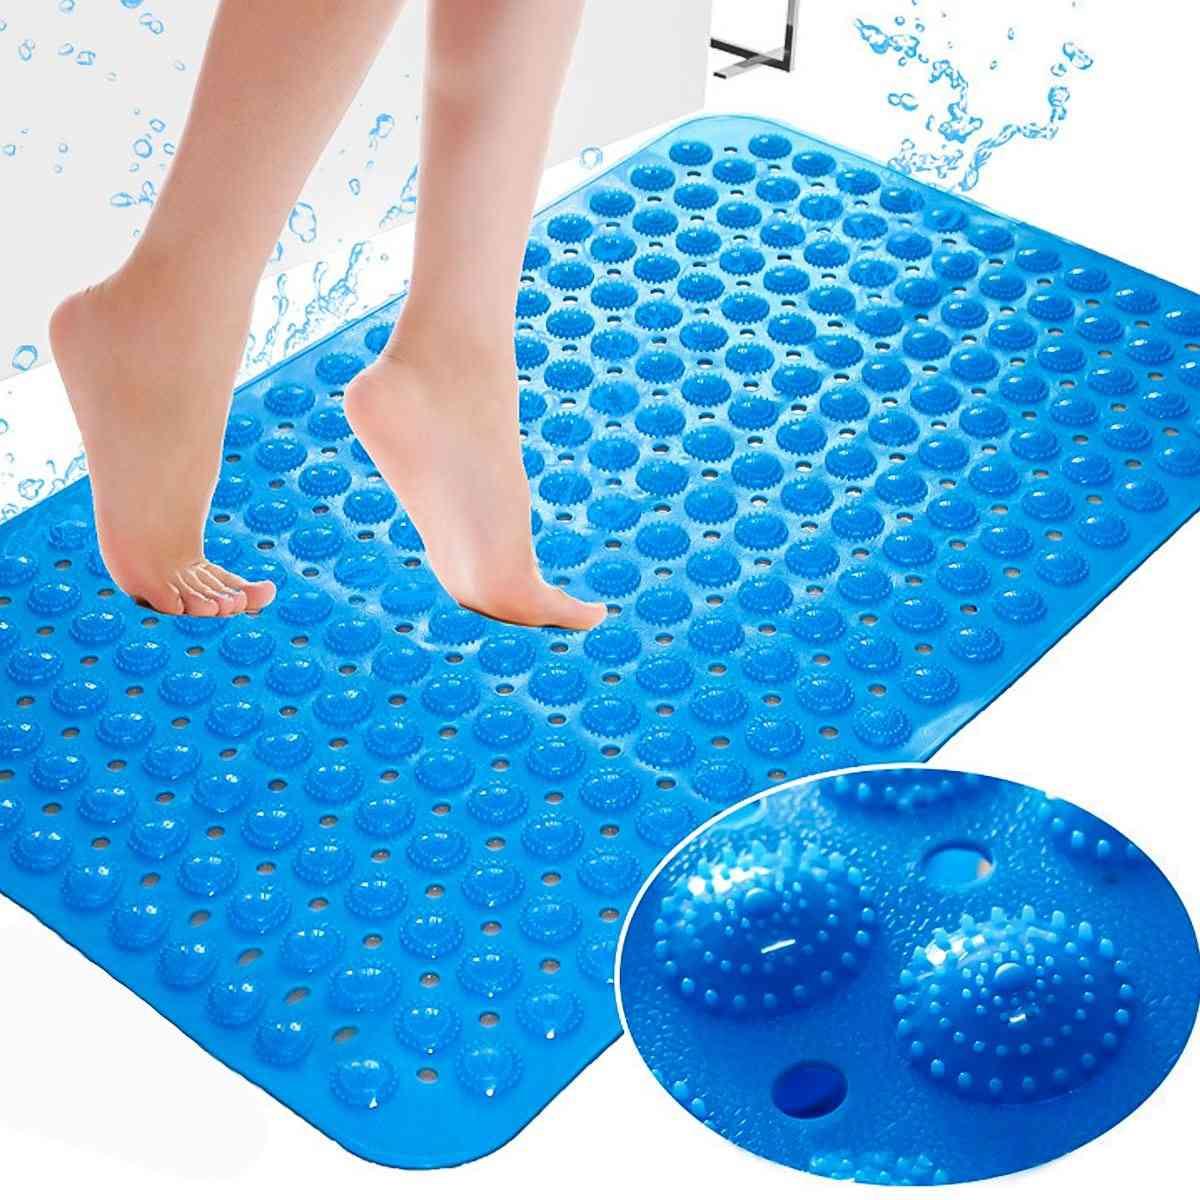 Pvc Massage Particles Foot Pad Large Strong Suction Anti Slip Bathroom Mat - Anti Slip Bath Shower Mat Odorless Non Toxic Bath Mat